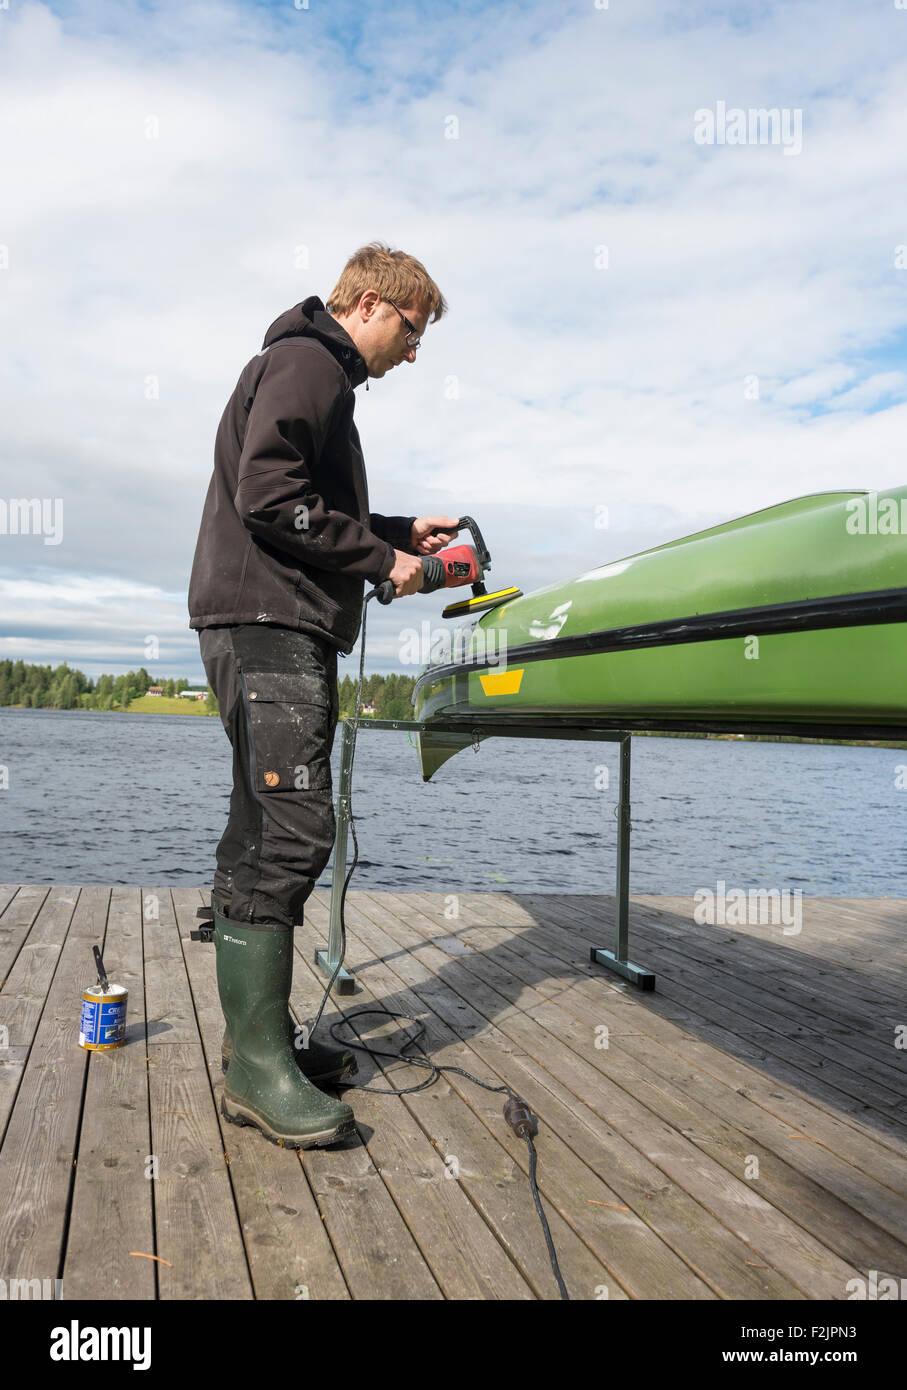 Man polishing a canoe - Stock Image